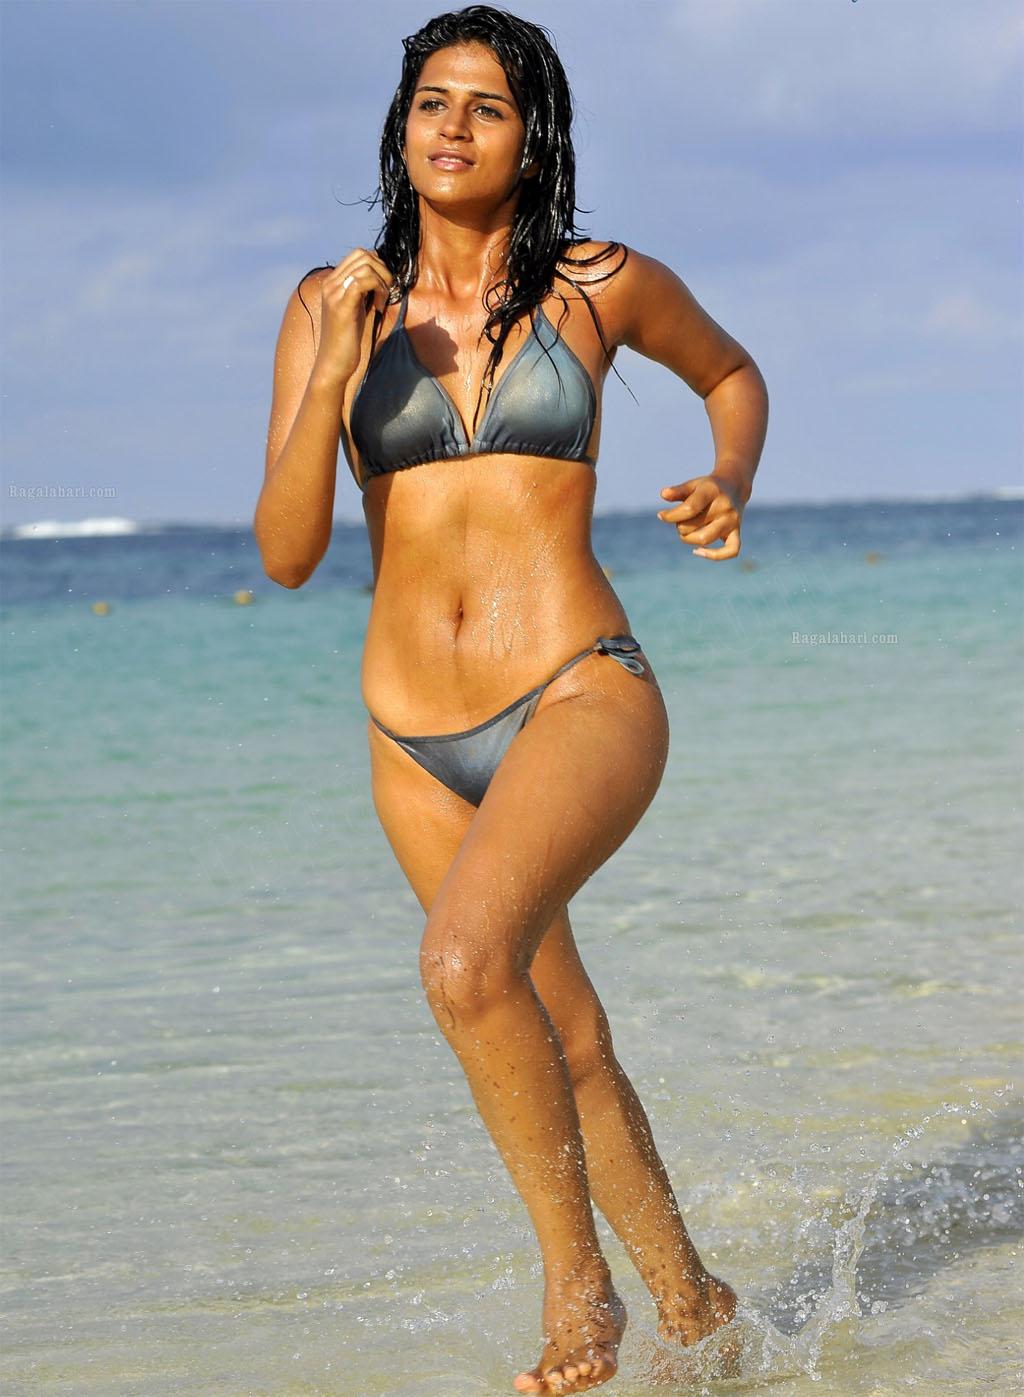 Thanks Shraddha das hot bikini amusing